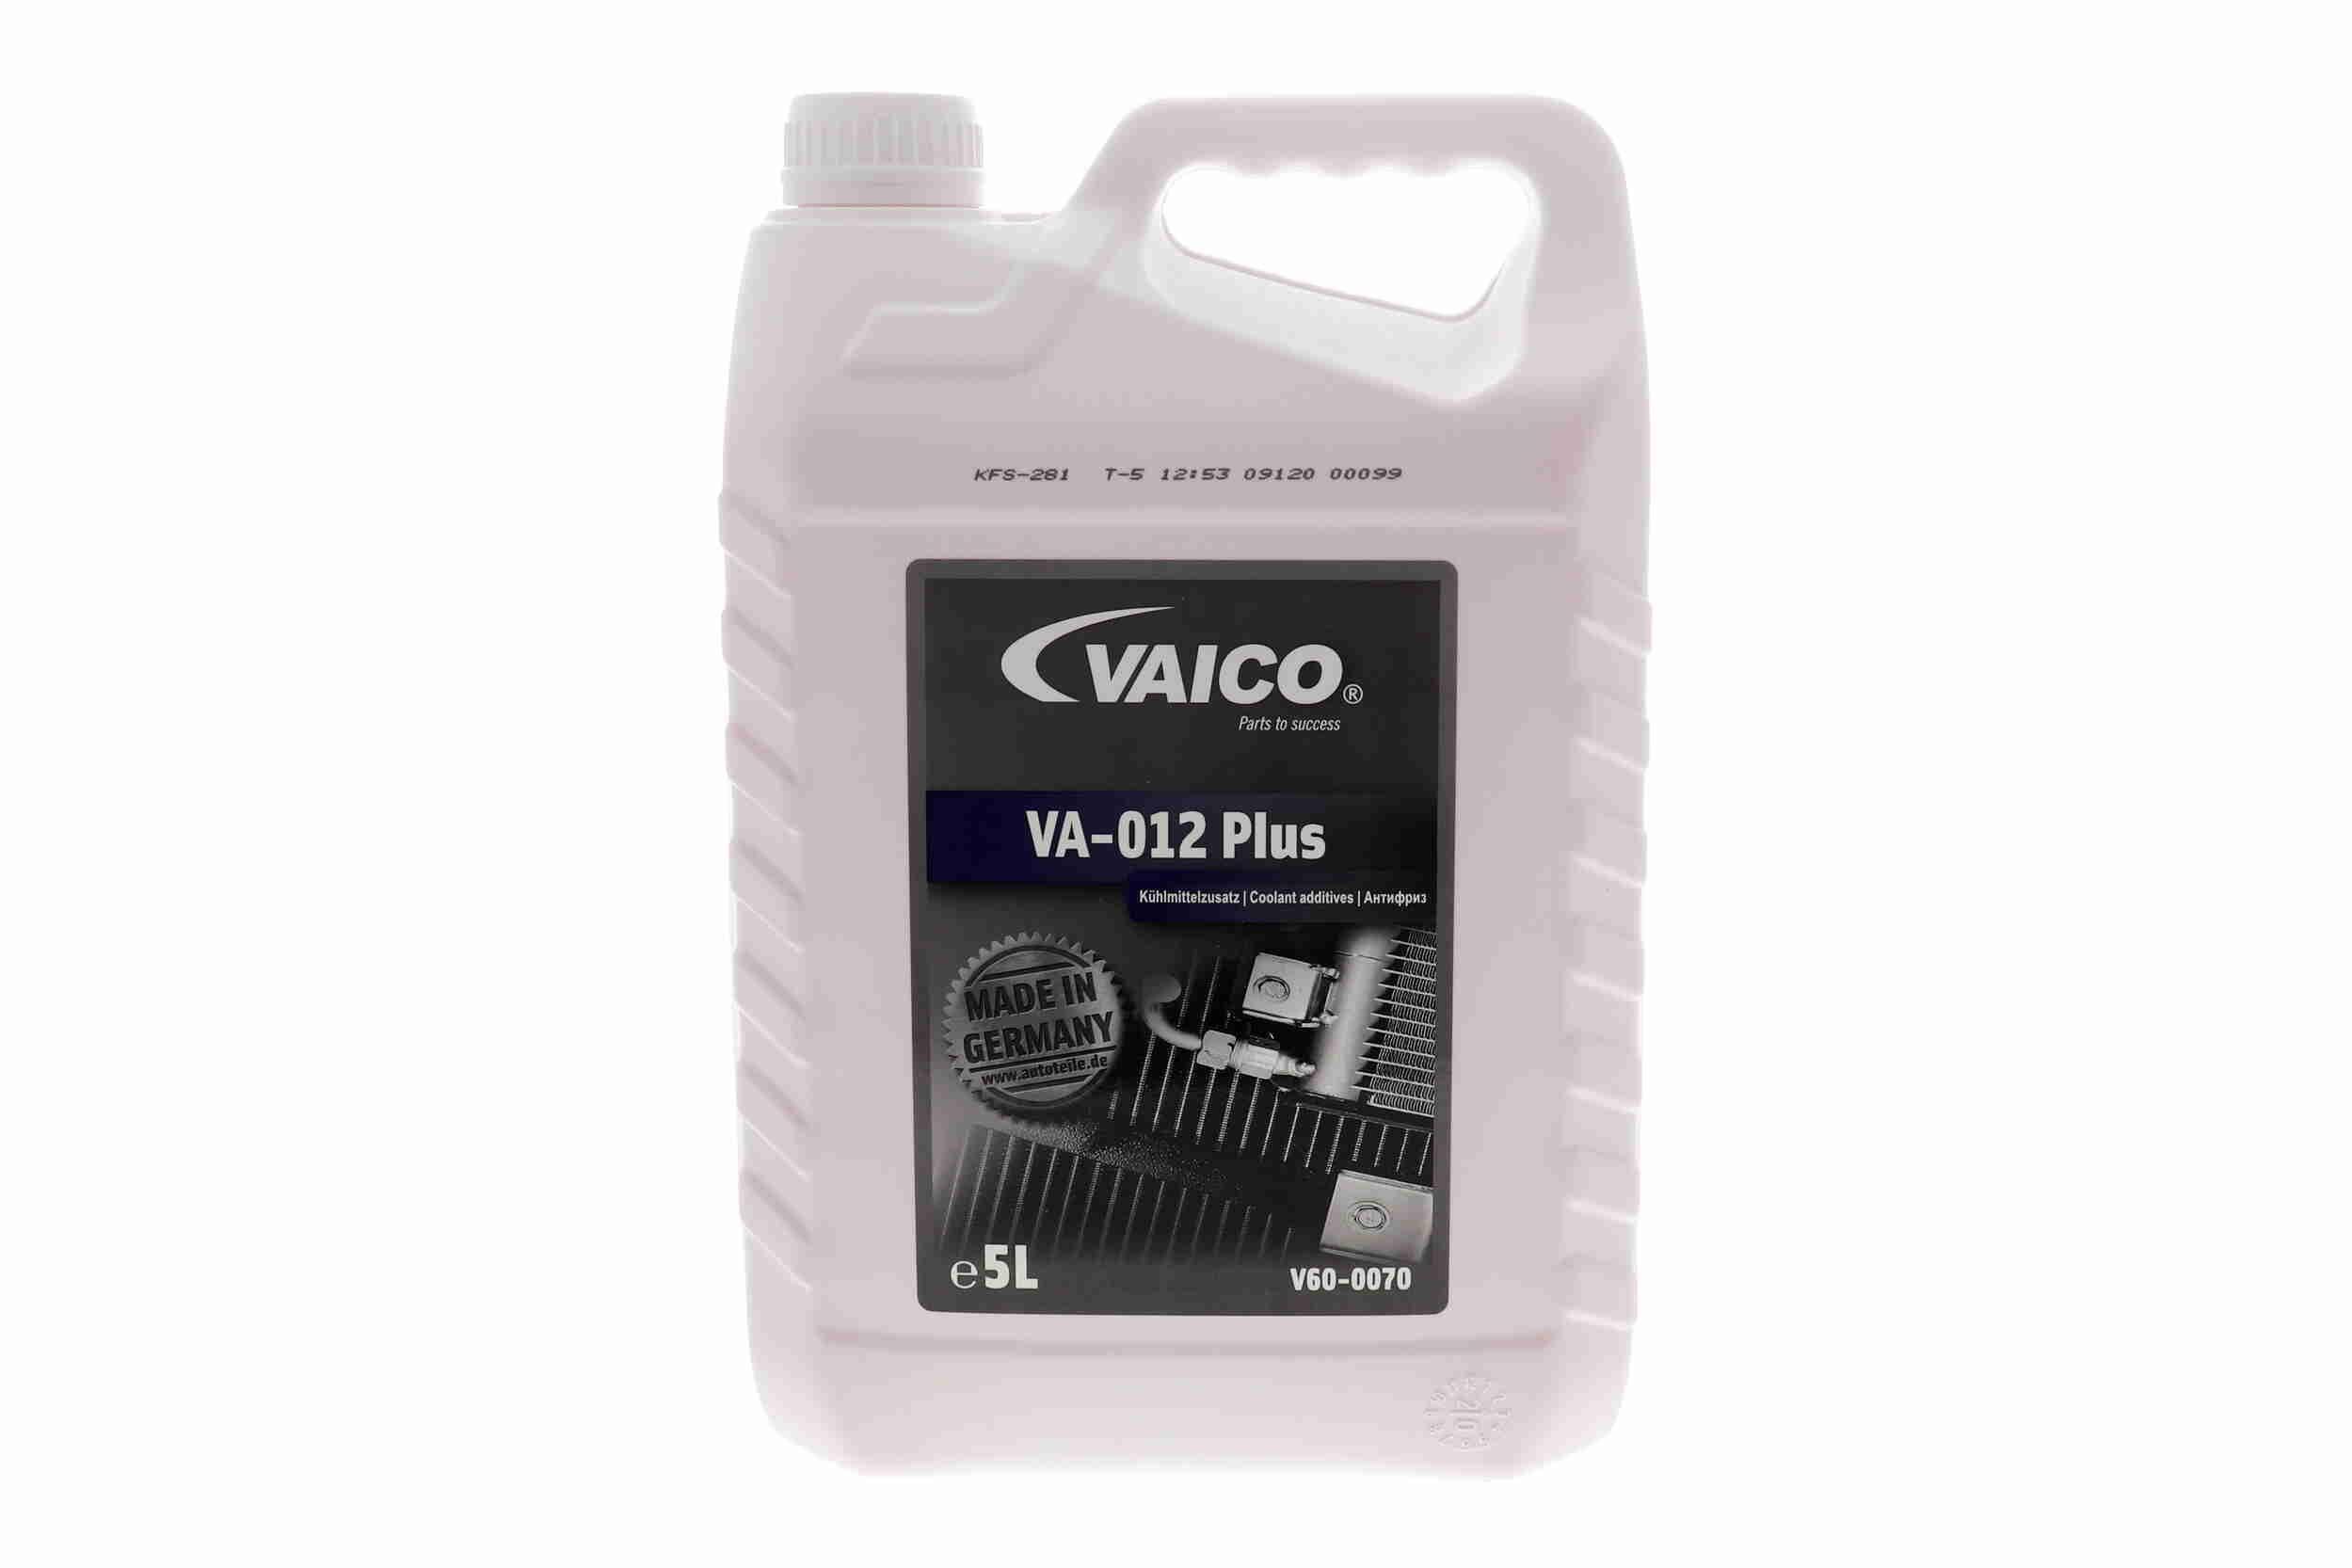 V60-0070 Frostschutzmittel VAICO - Markenprodukte billig